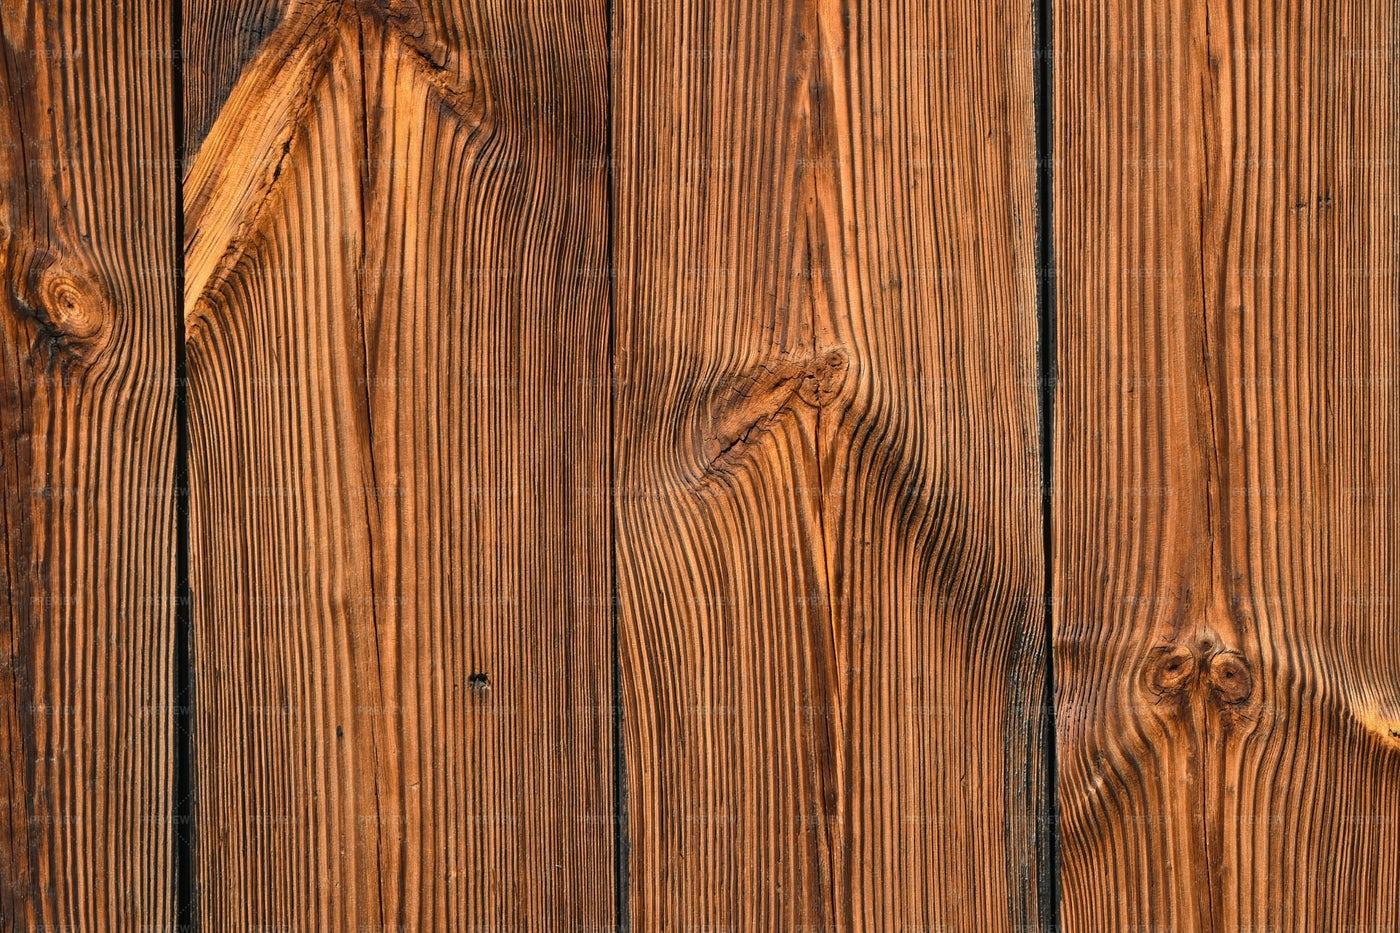 Vertical Wooden Panels: Stock Photos